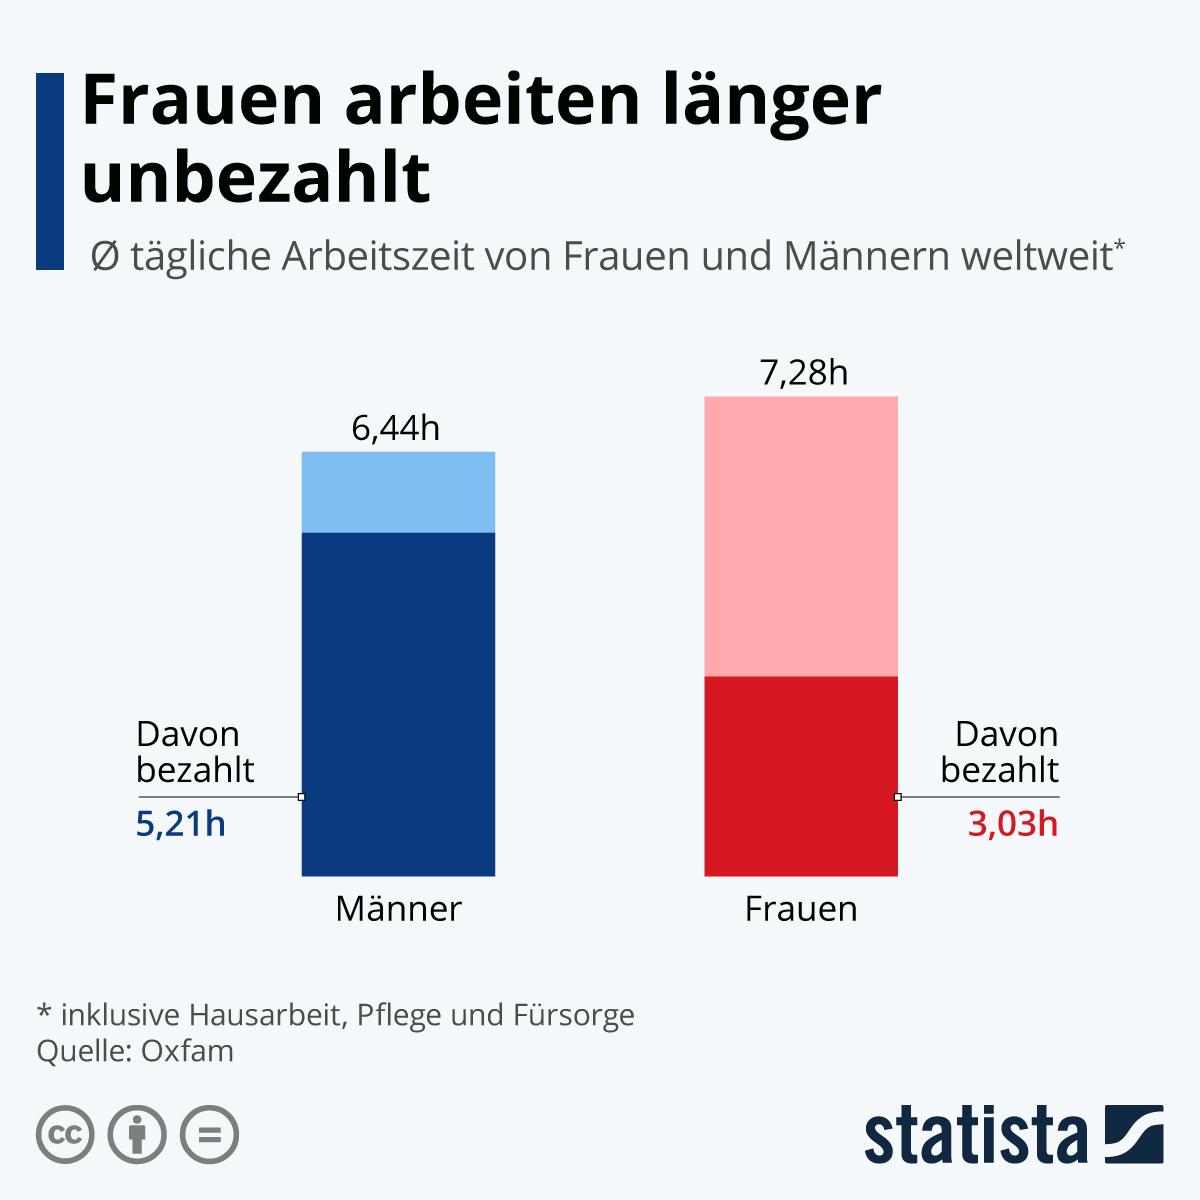 Infografik: Frauen arbeiten länger unbezahlt | Statista